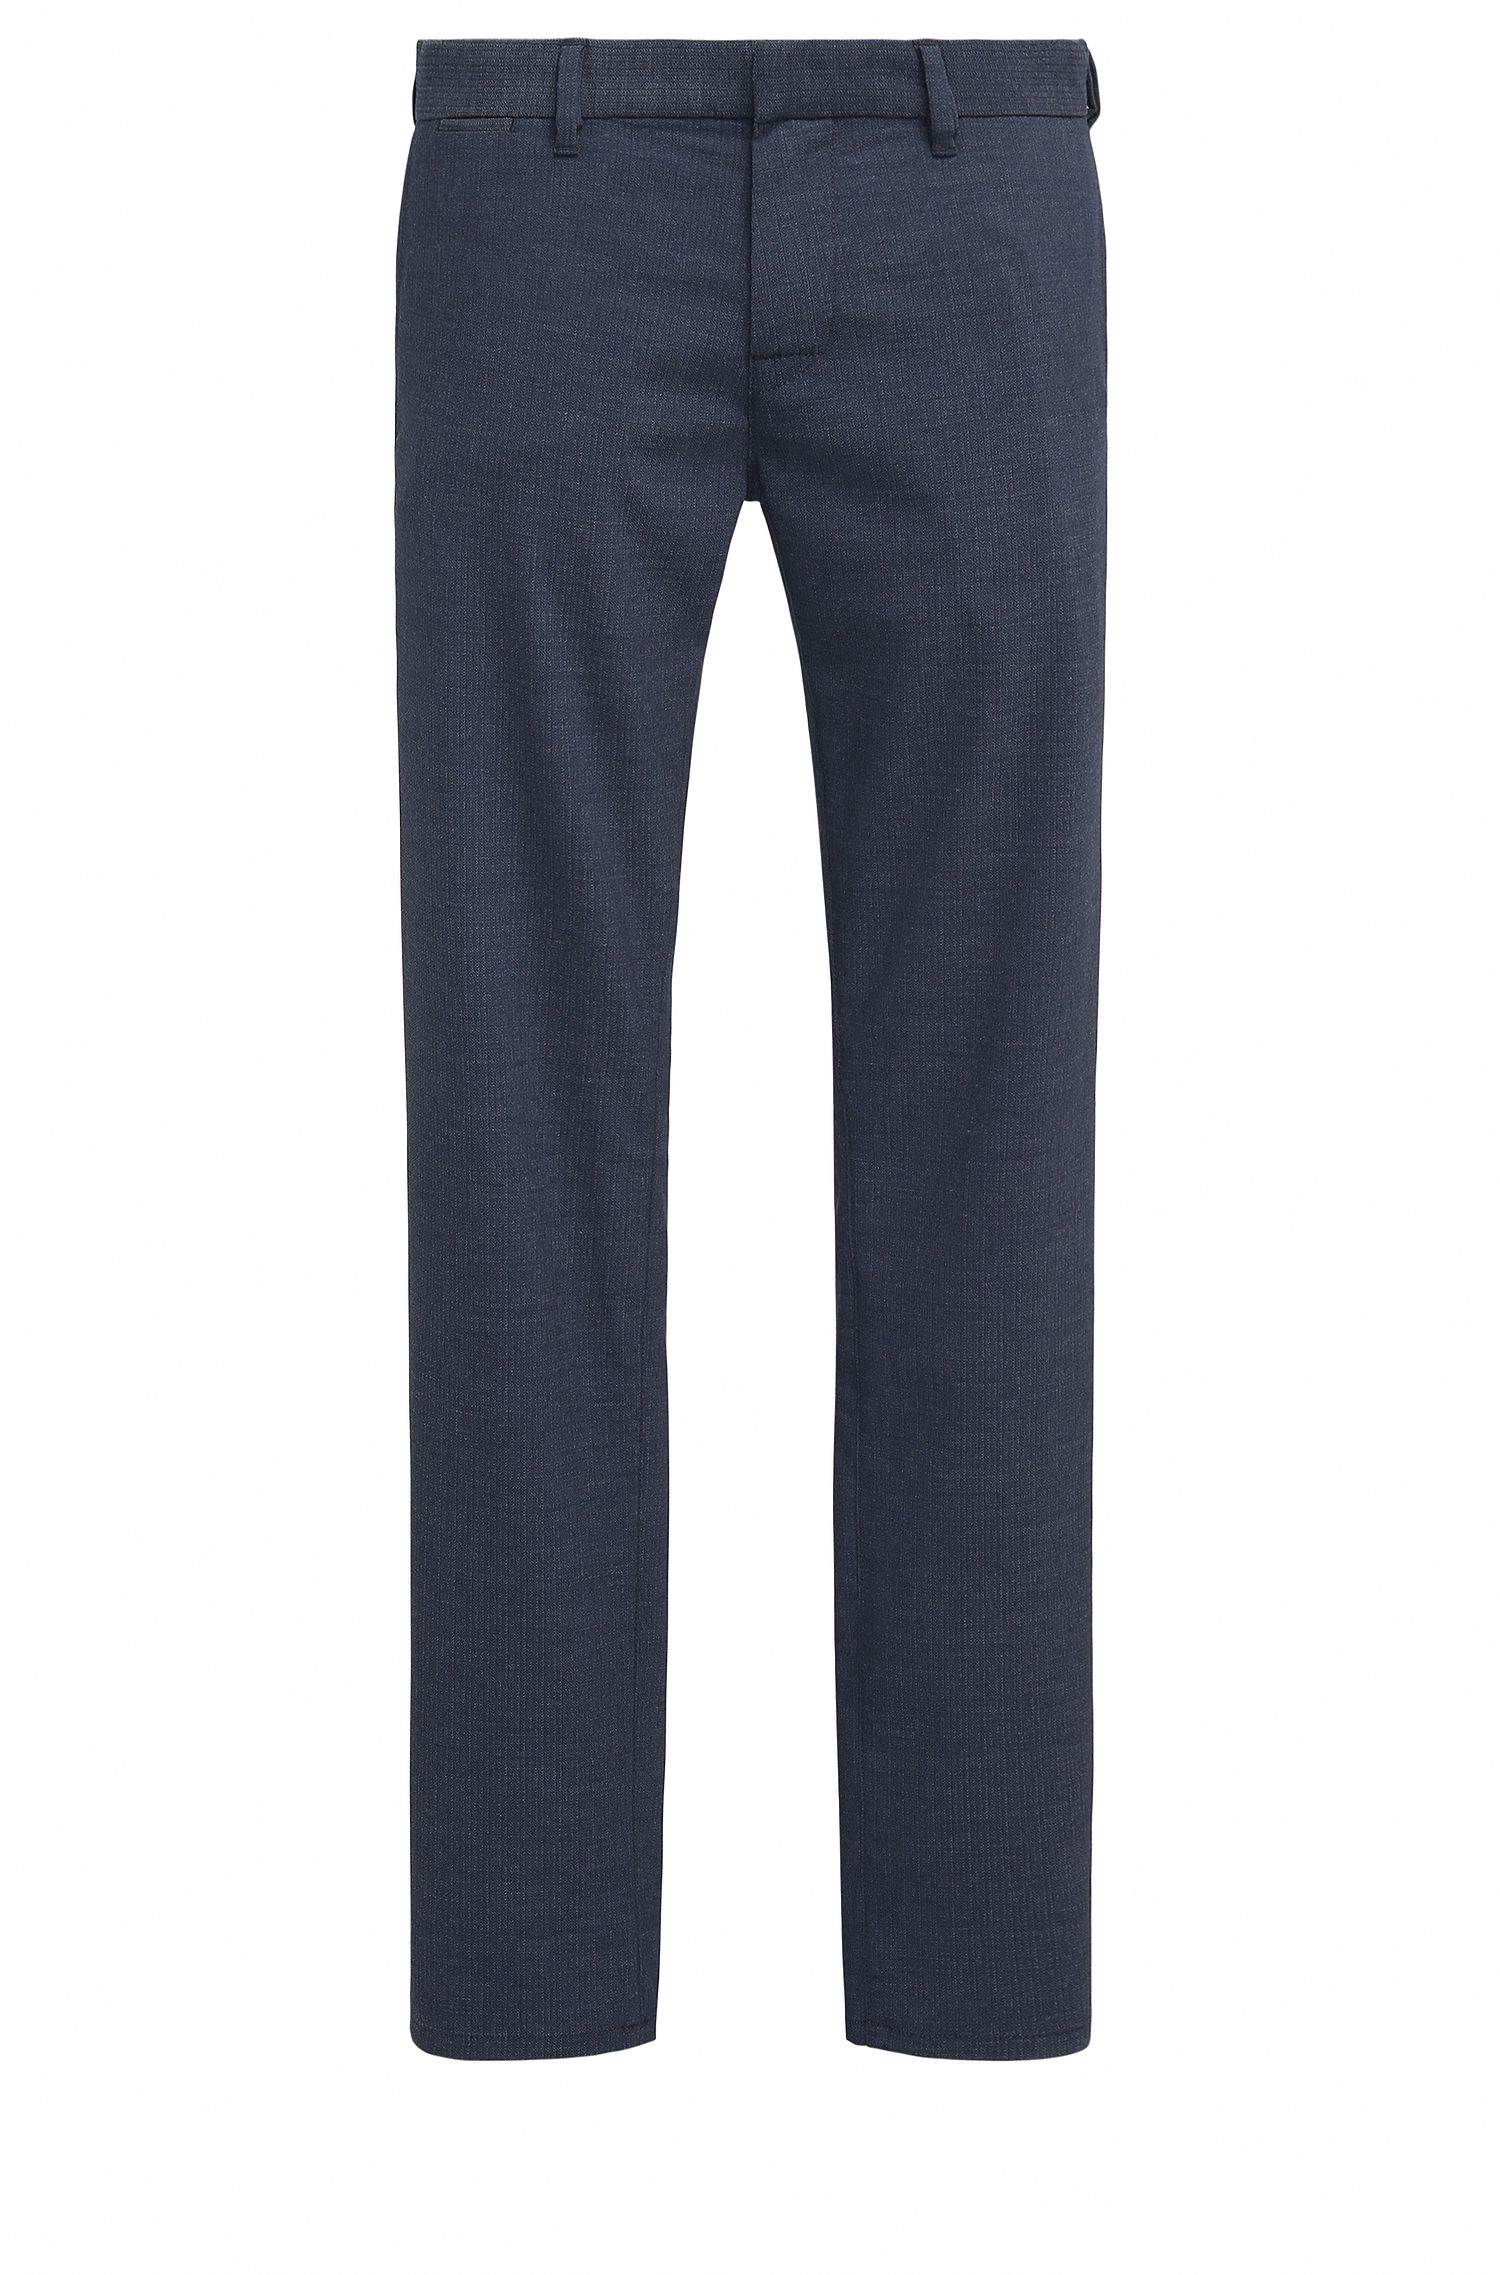 Viscose Blend Pant, Slim Fit | Slim, Dark Blue